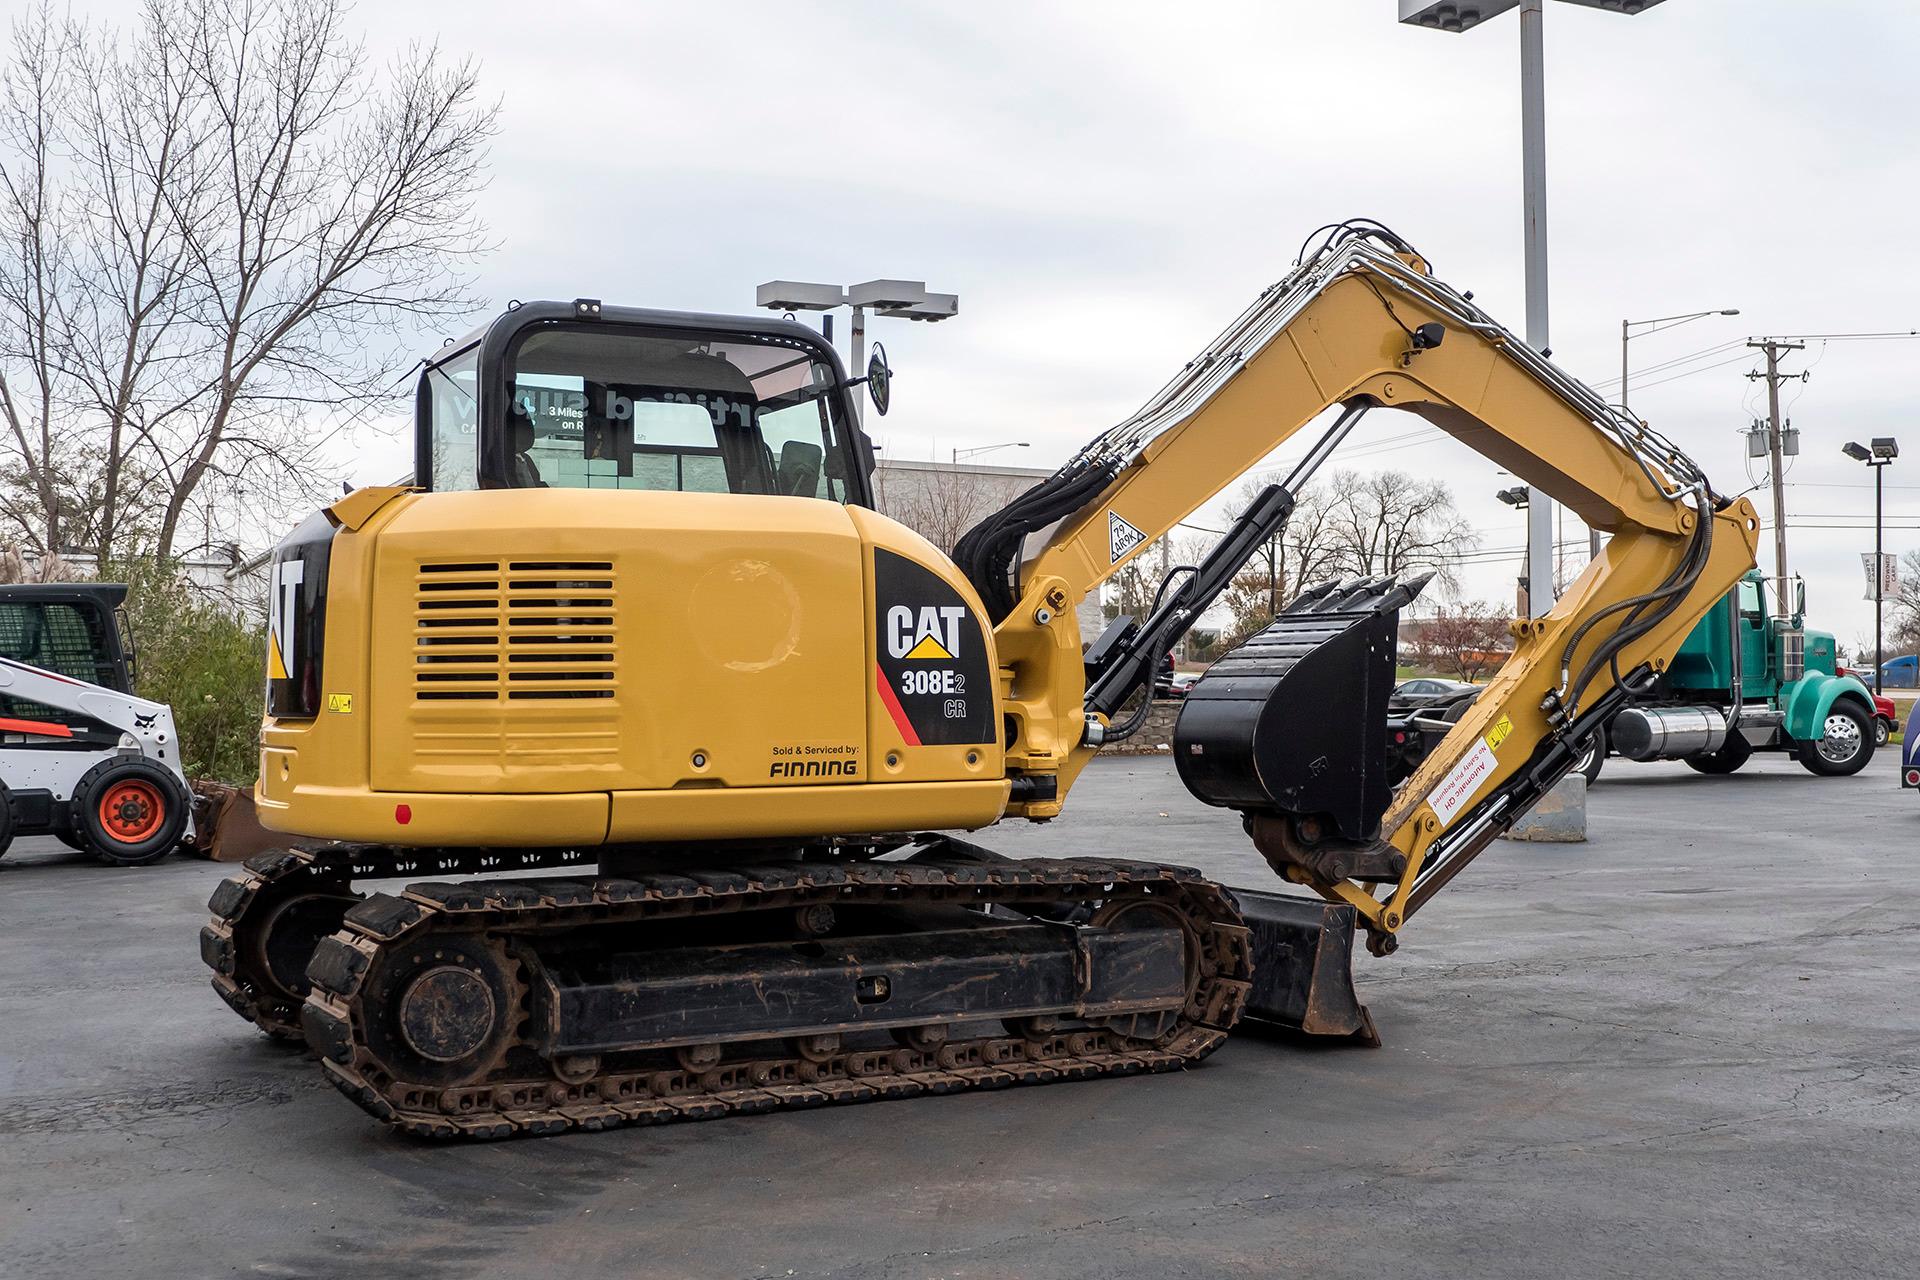 Used-2017-Caterpillar-308E2-Hydraulic-Excavator